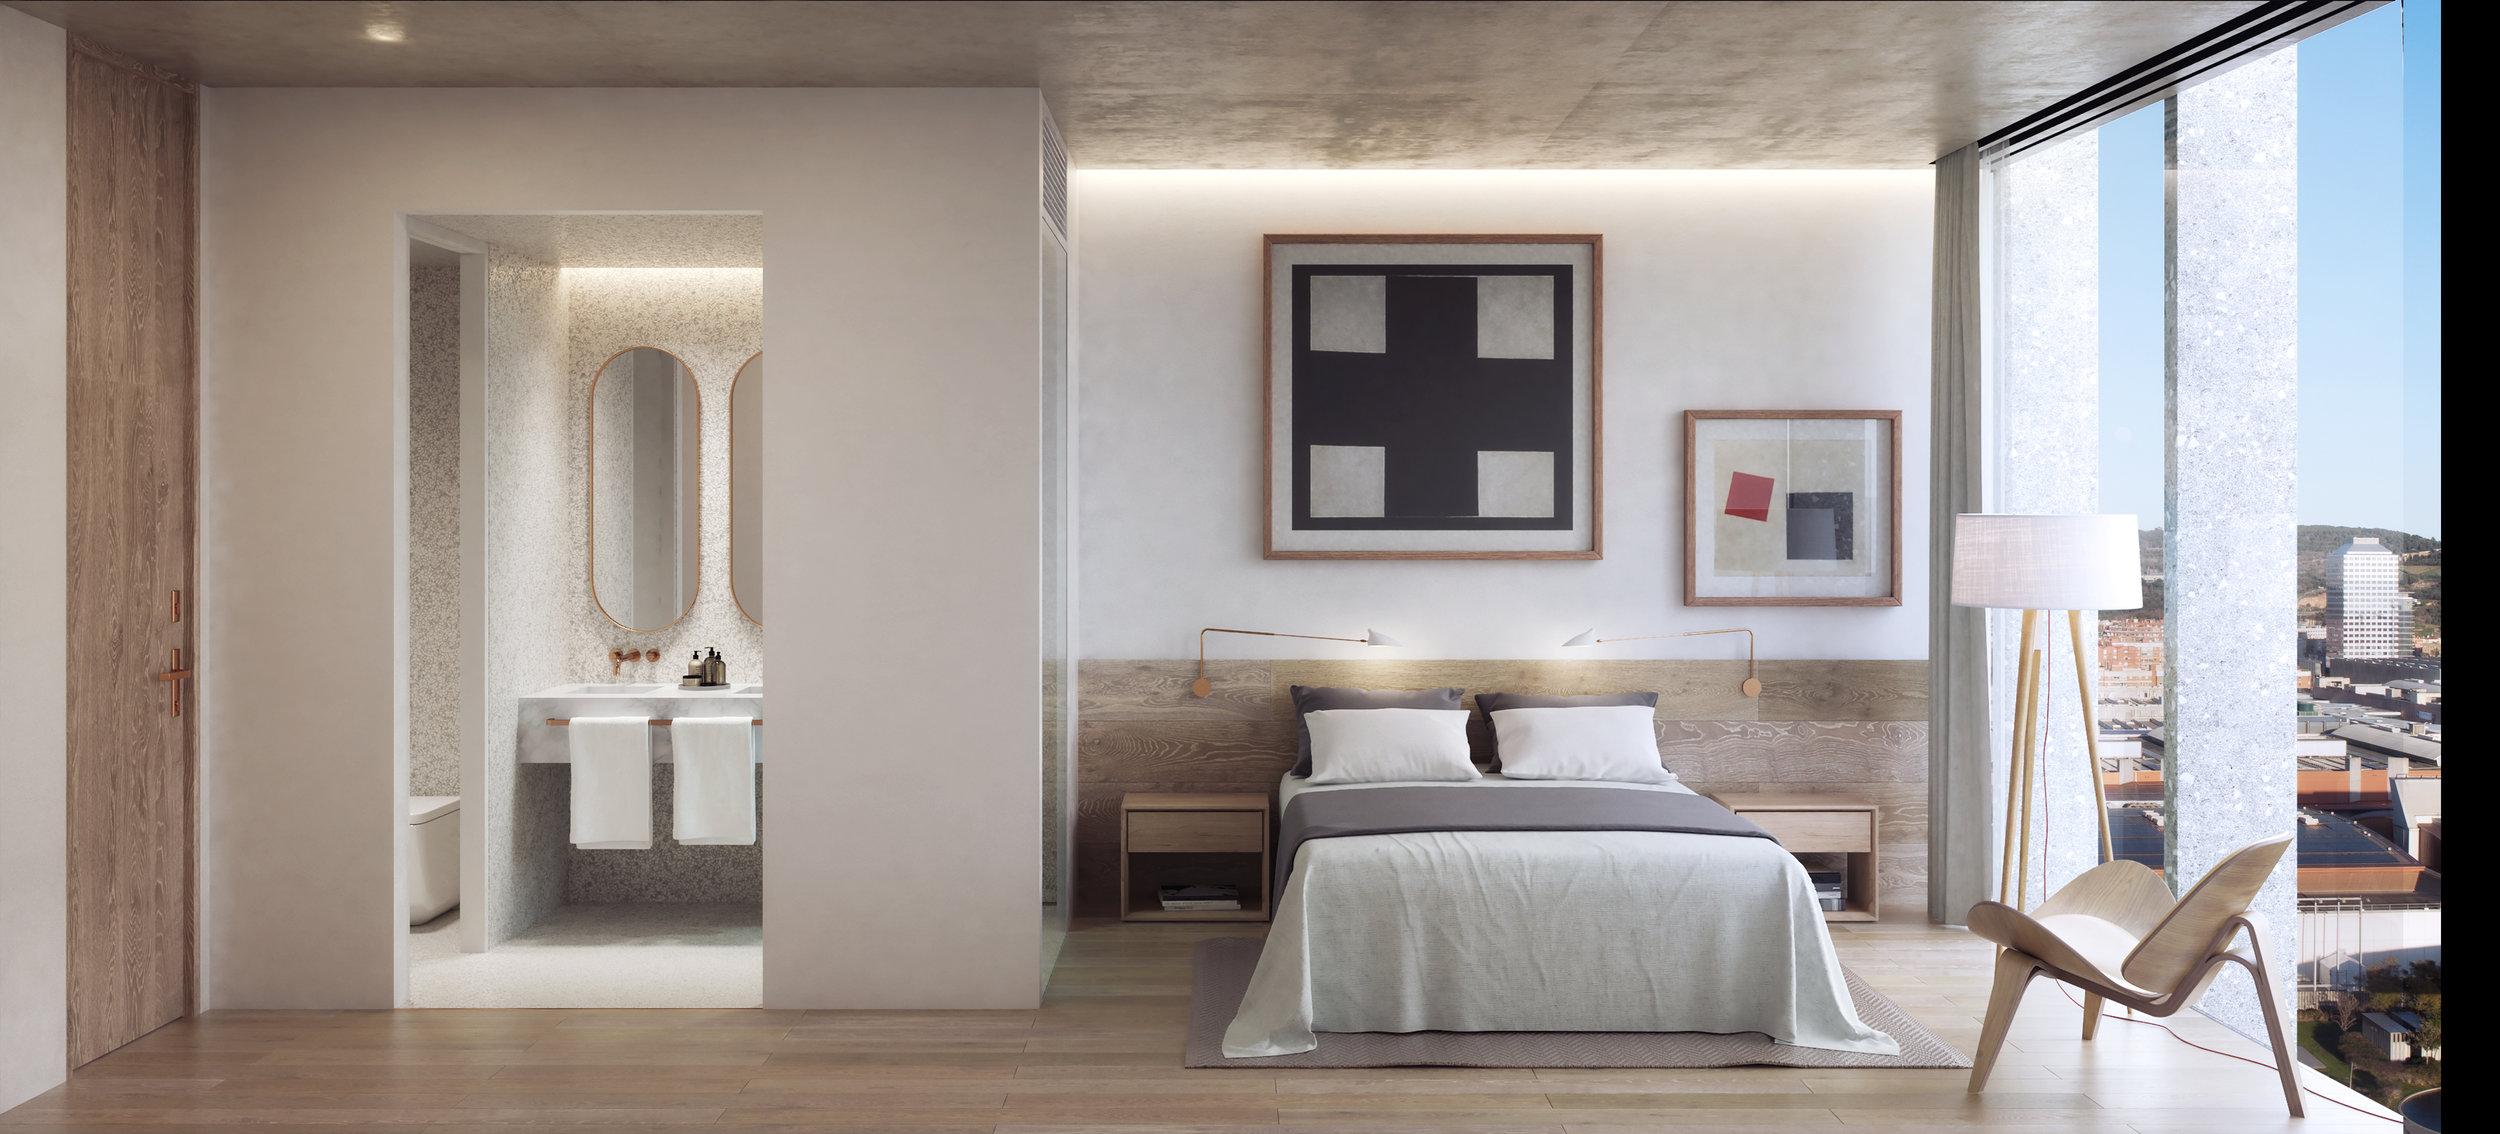 Hotel Europa |  b720 Arquitectos  | Barcelona, Spain